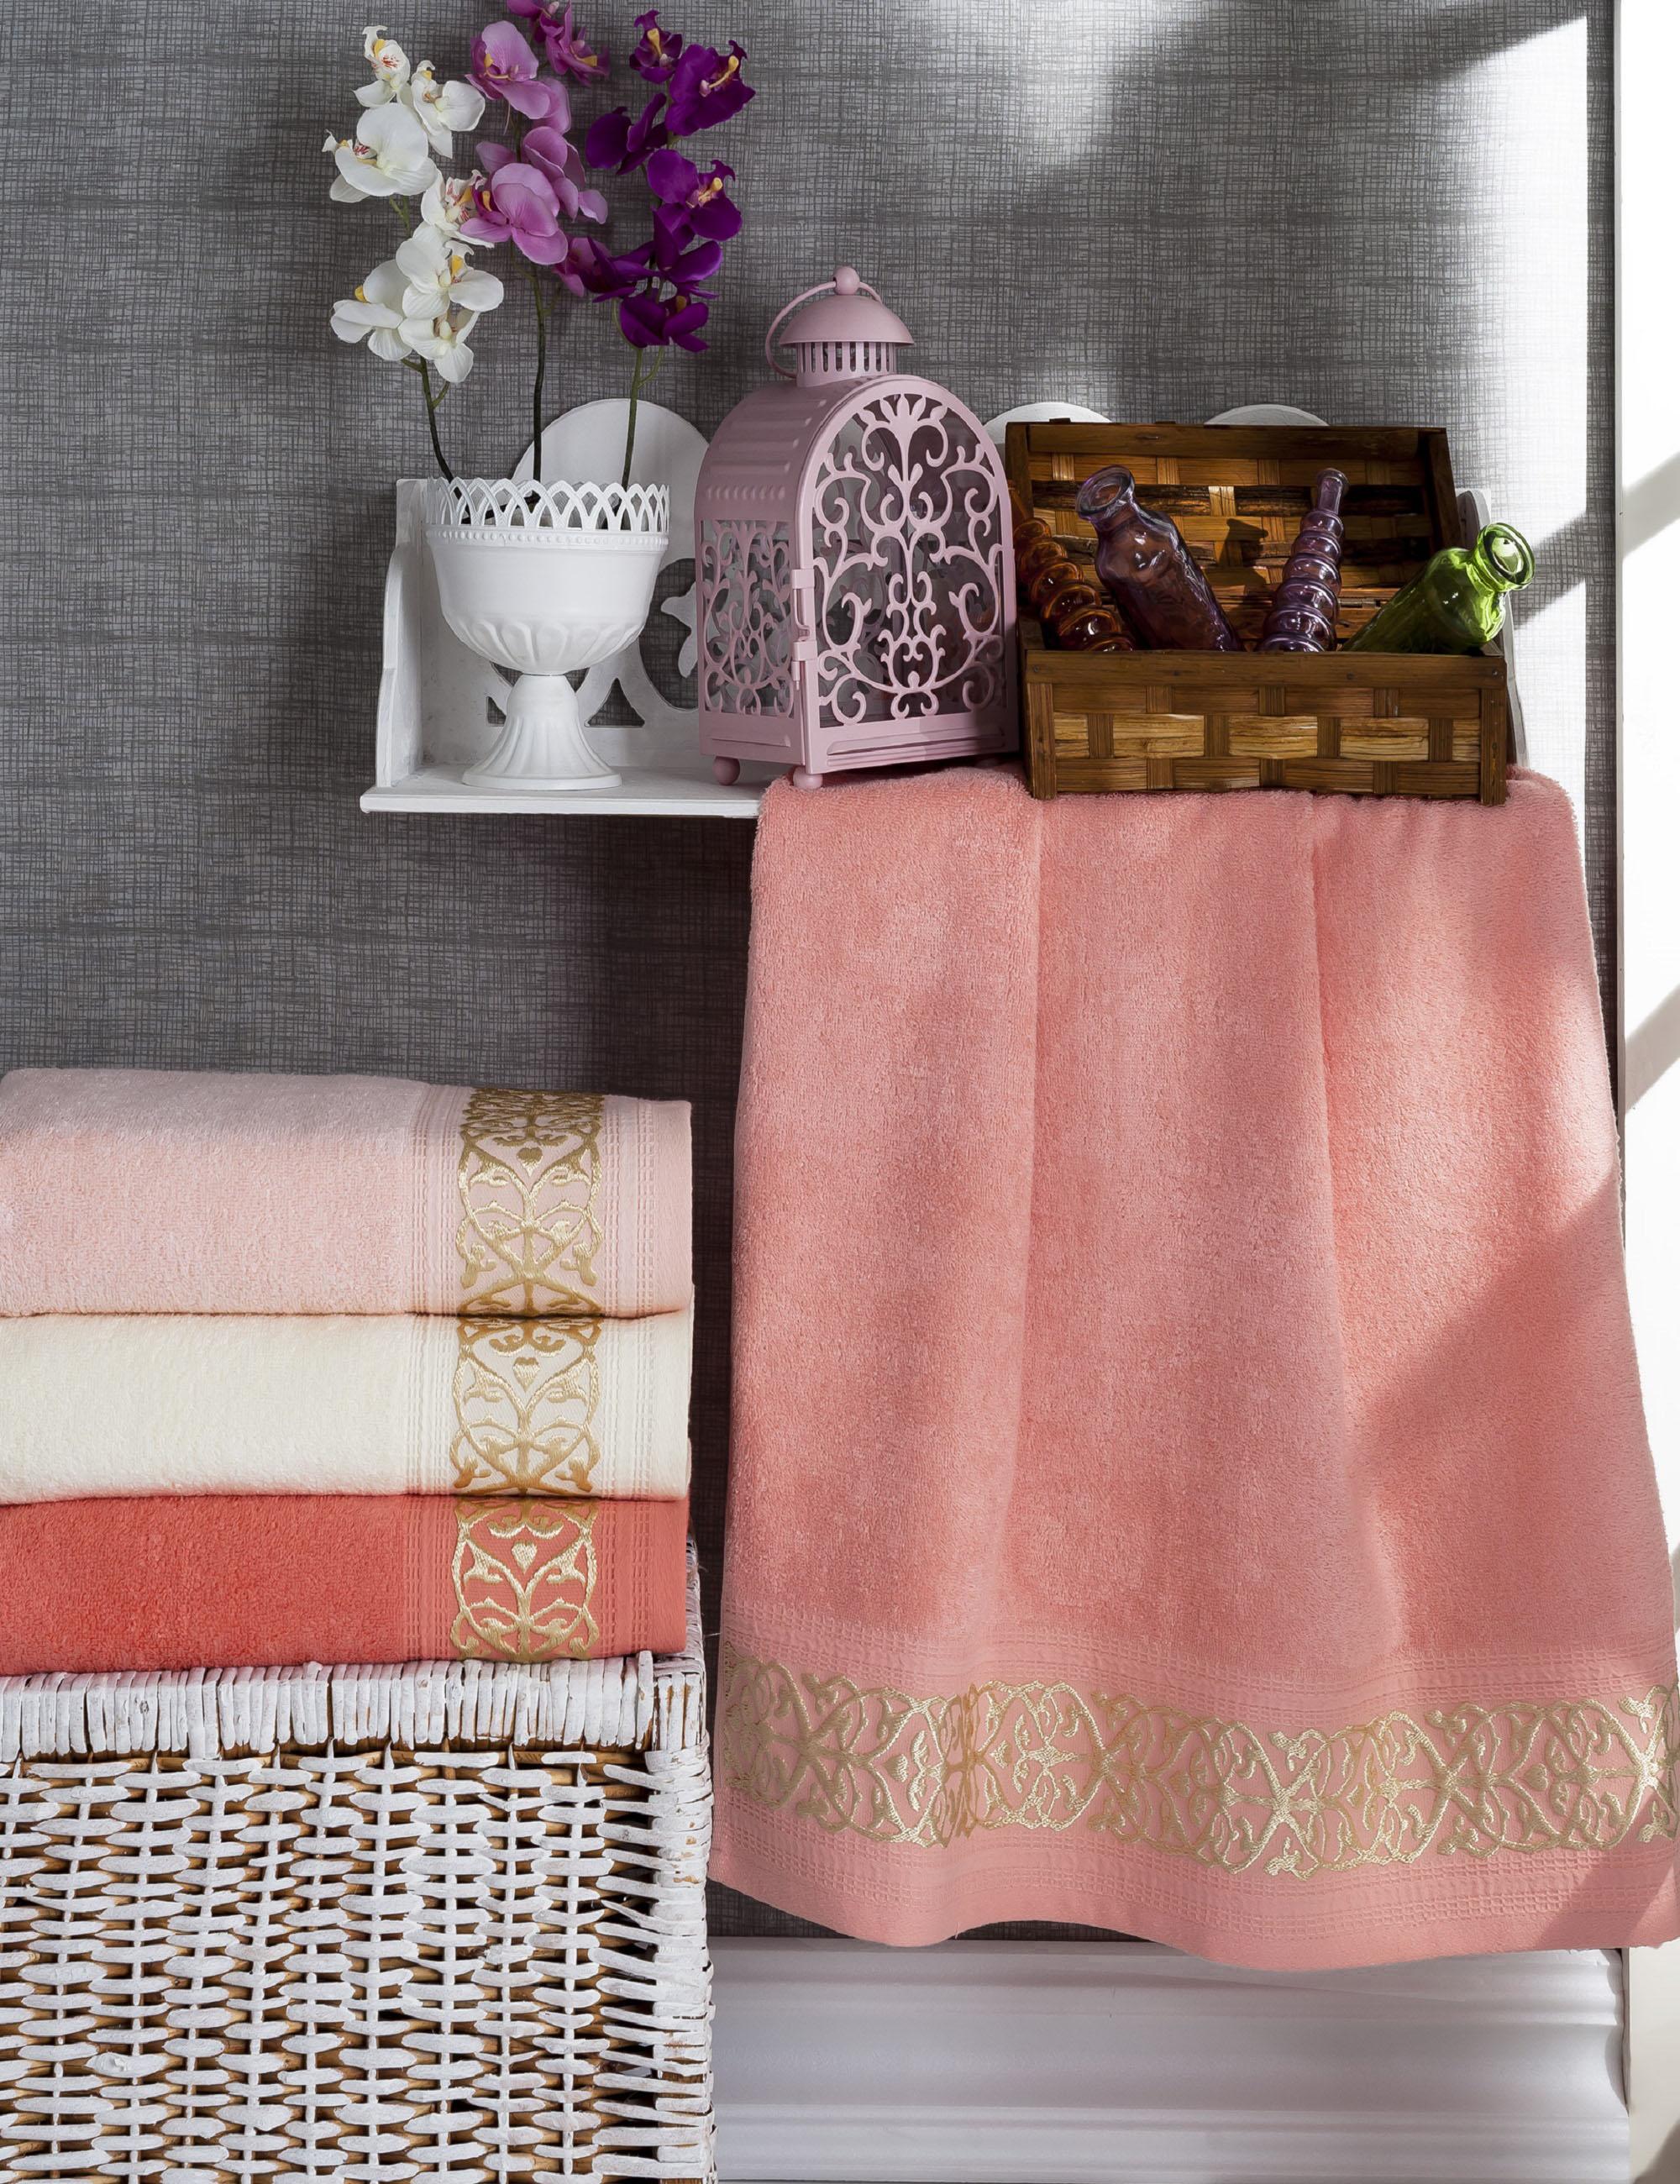 Полотенца DO'n'CO Набор Полотенец Selena (70х140 см - 4 шт) полотенца do n co набор полотенец clara 70х140 см 4 шт